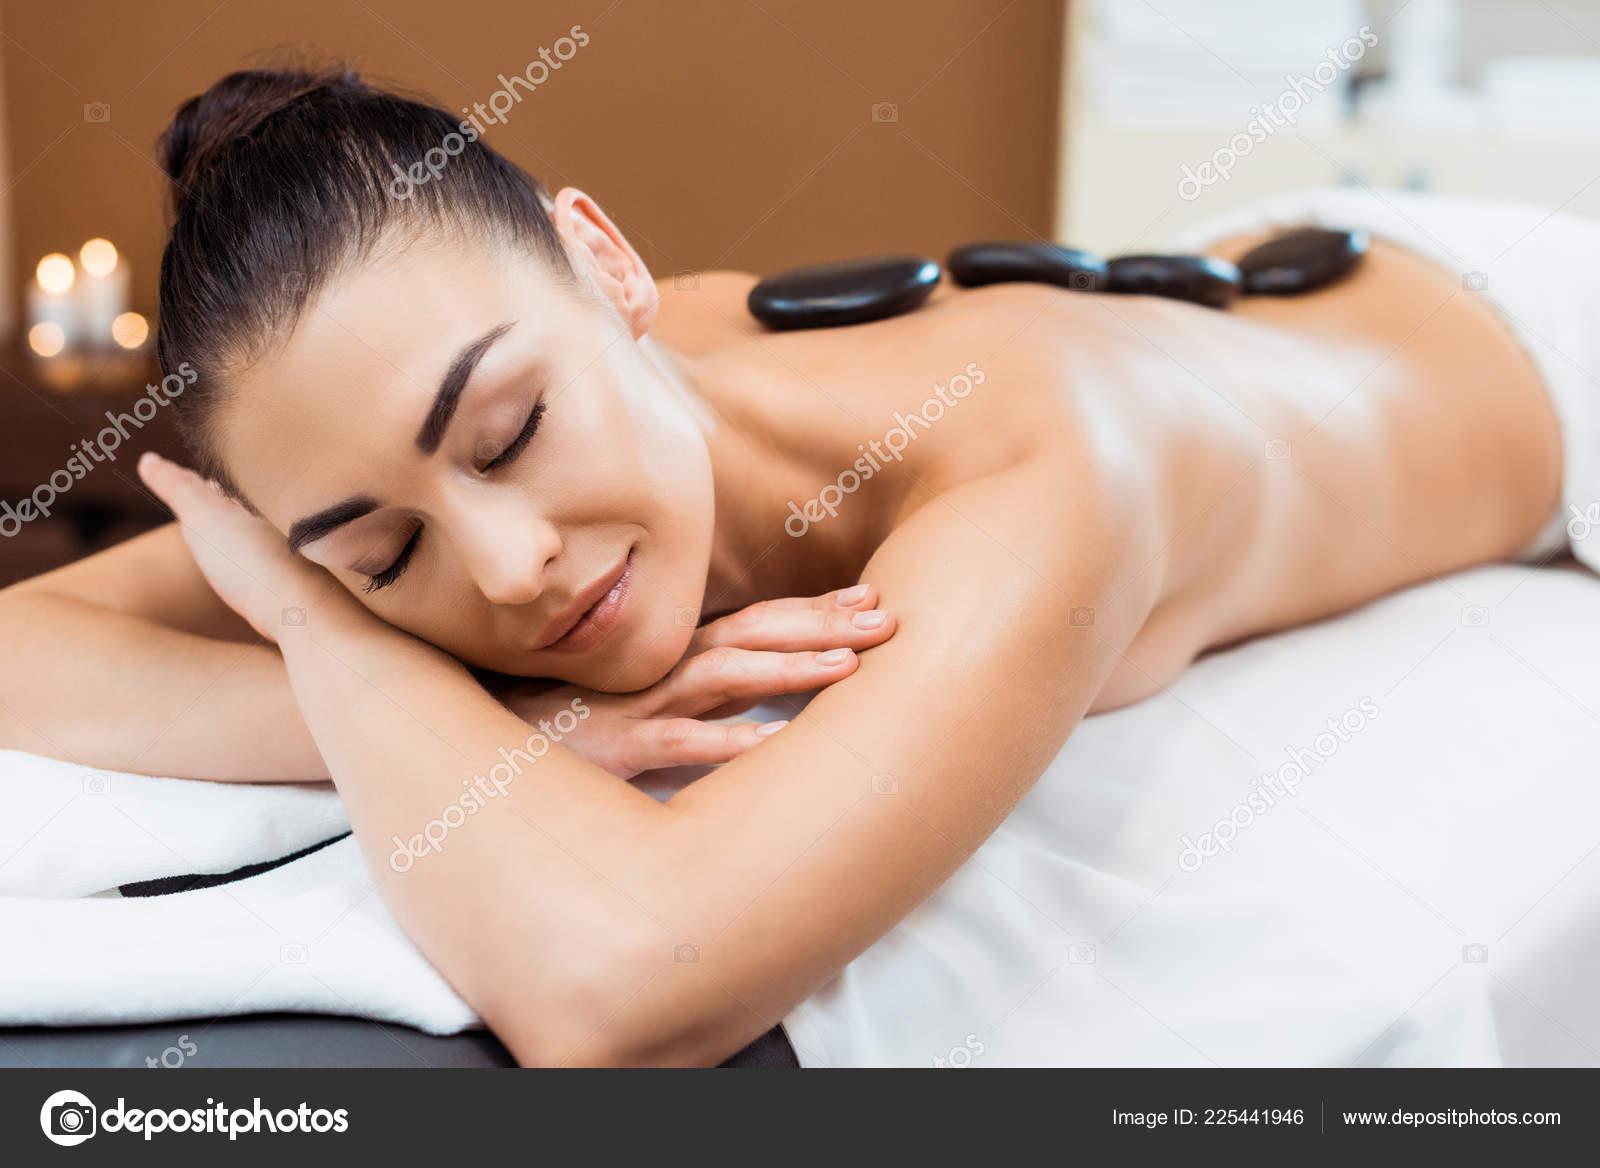 Hot black girl massage